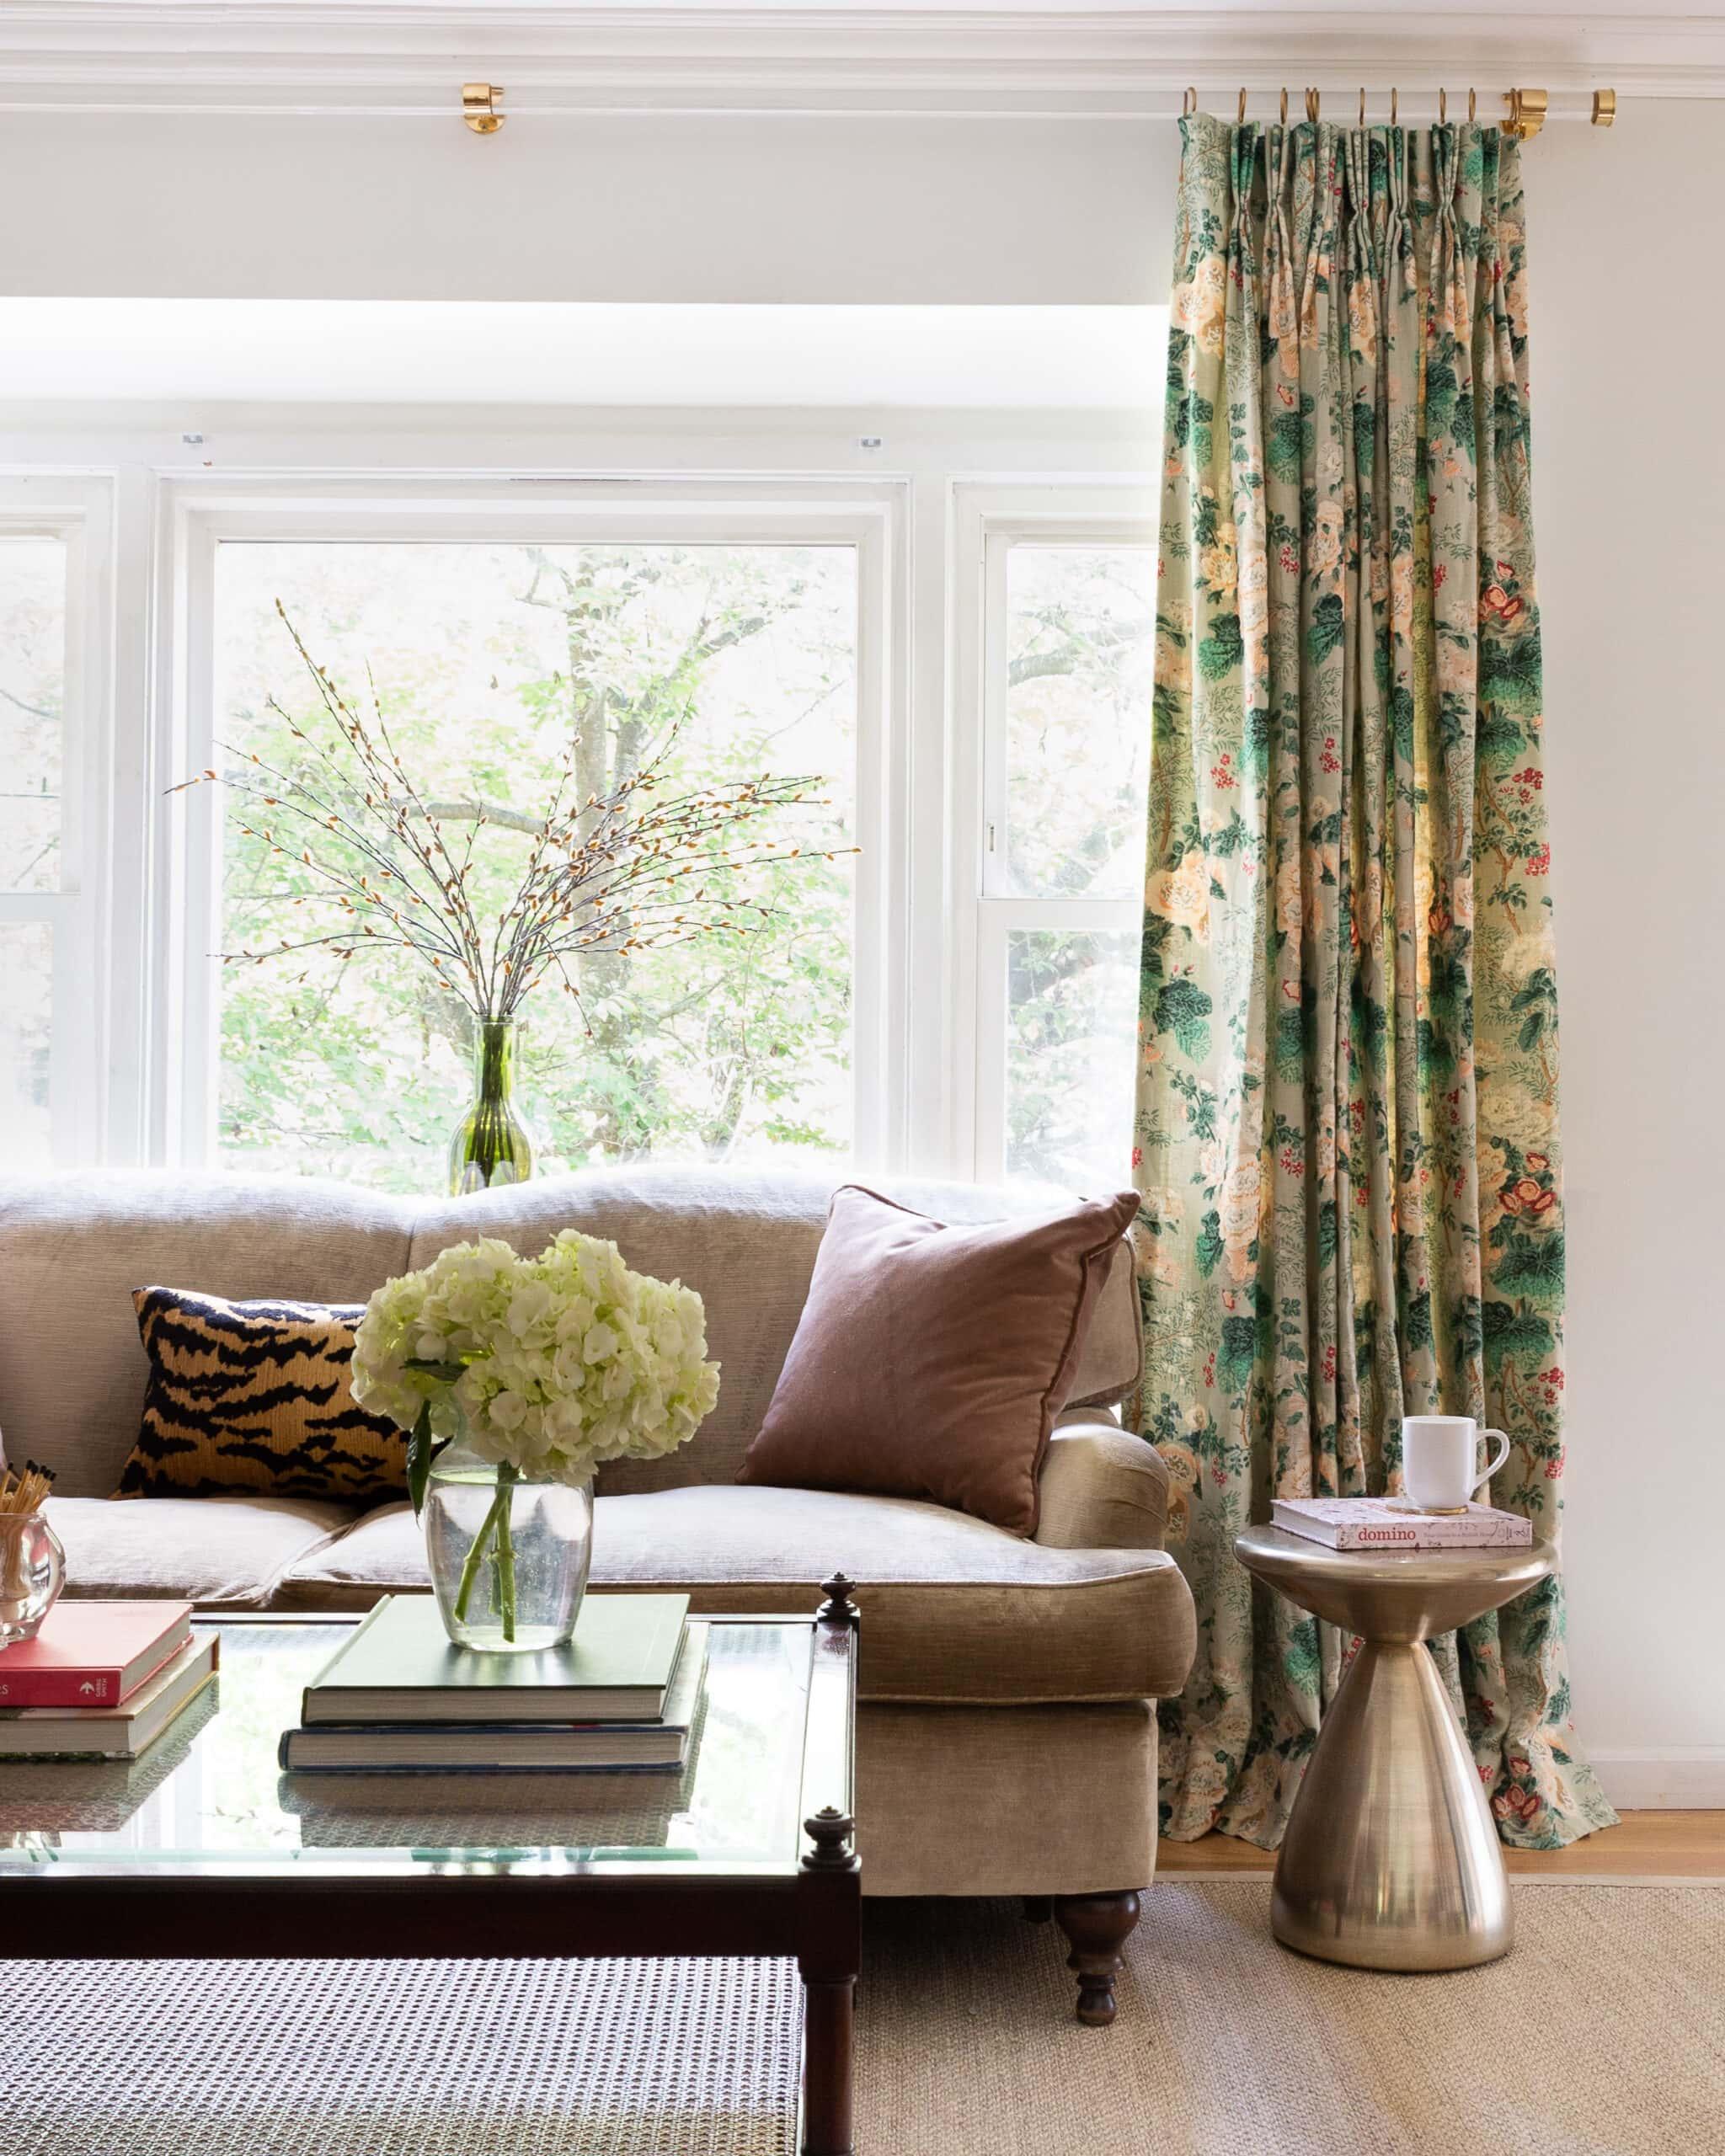 diy custom lucite curtain or towel rod